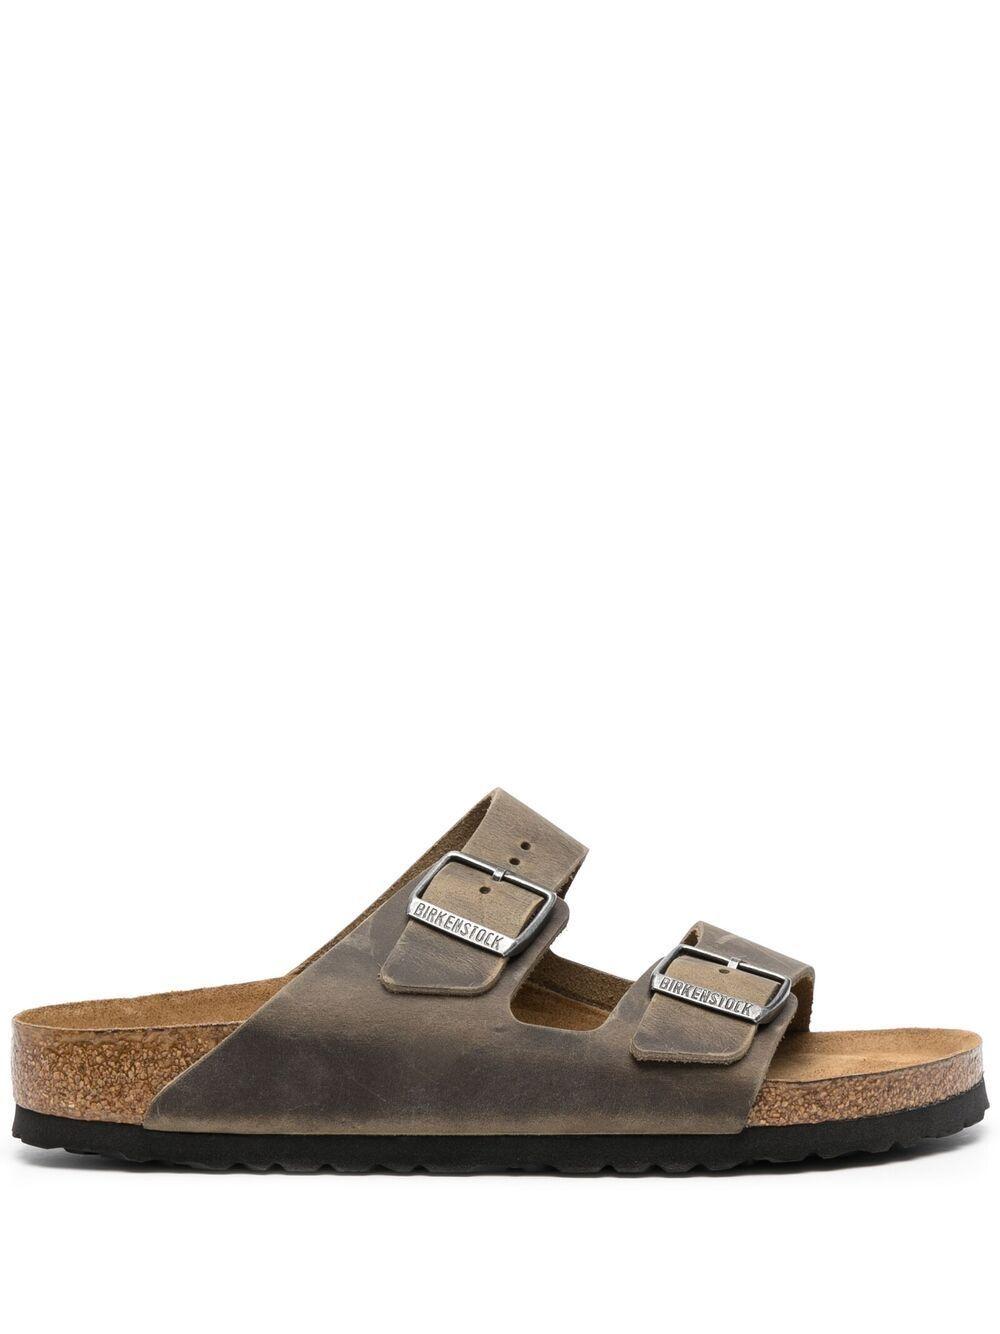 Sandalo arizona in pelle